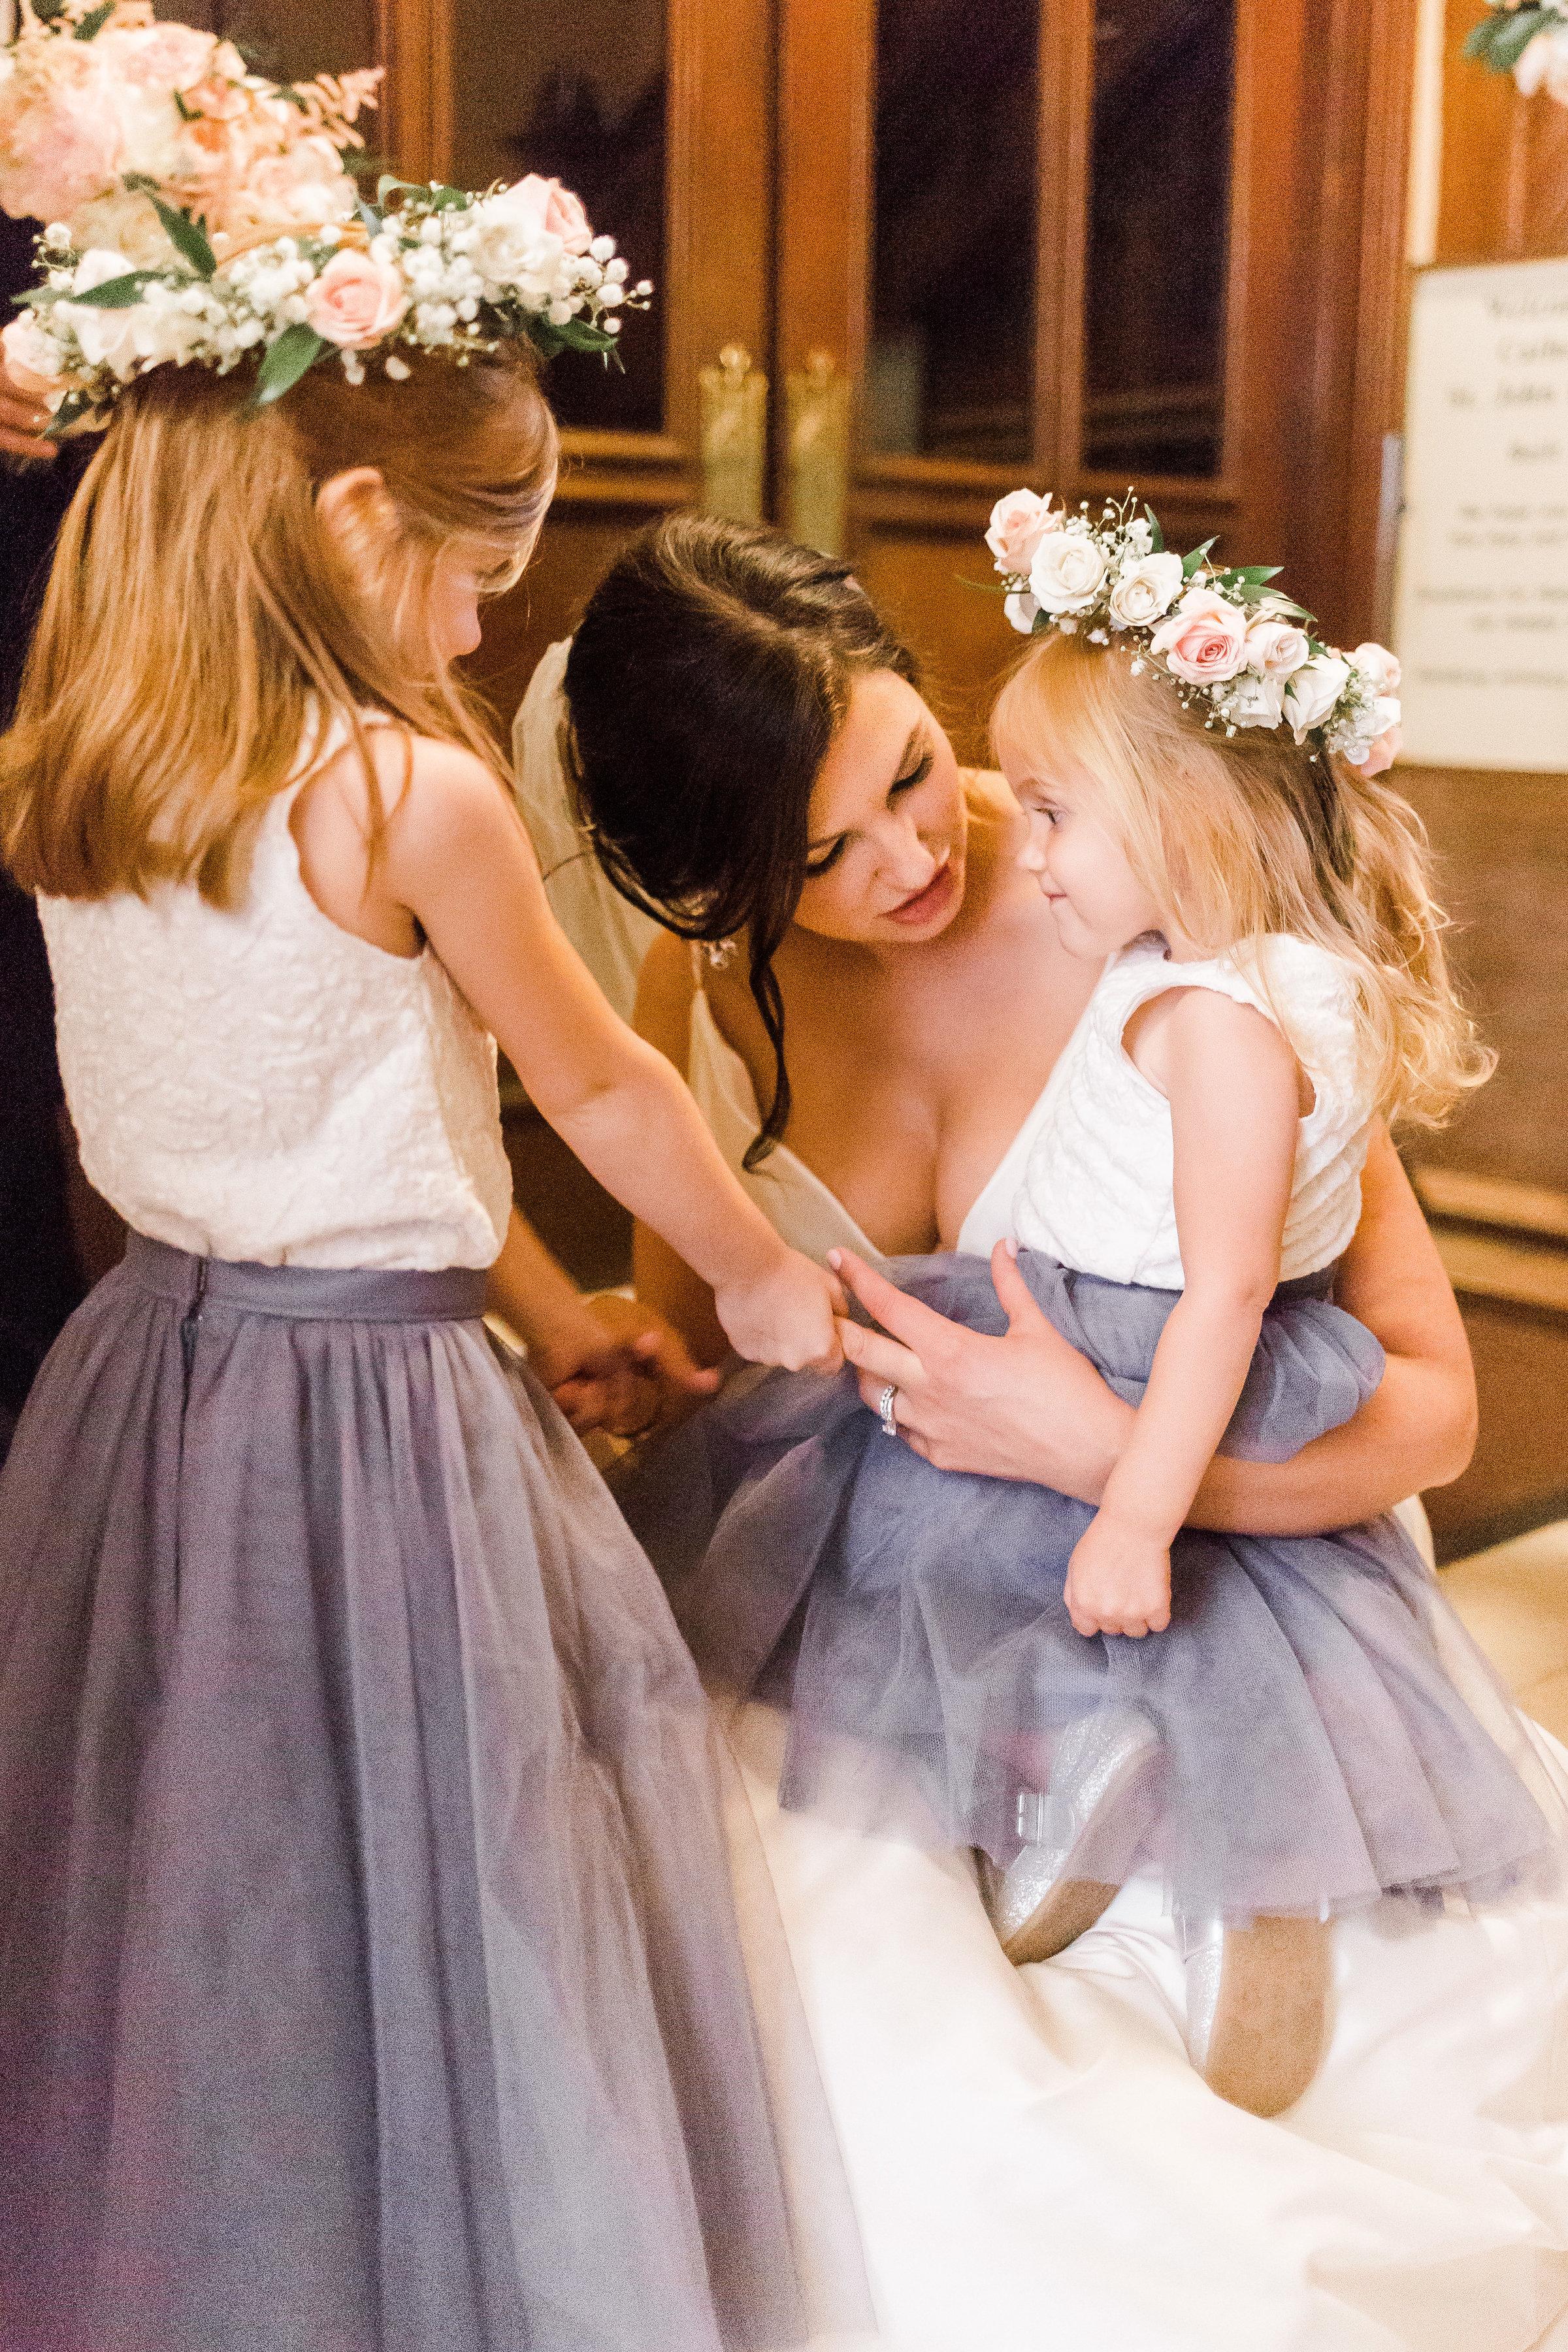 savannah-bridal-shop-ivory-and-beau-bridesmaids-meagans-bride-tribe-jb-marie-photography-jenny-yoo-bridesmaids-savannah-bridesmaids-dresses-savannah-bridesmaids-gowns-3.JPG